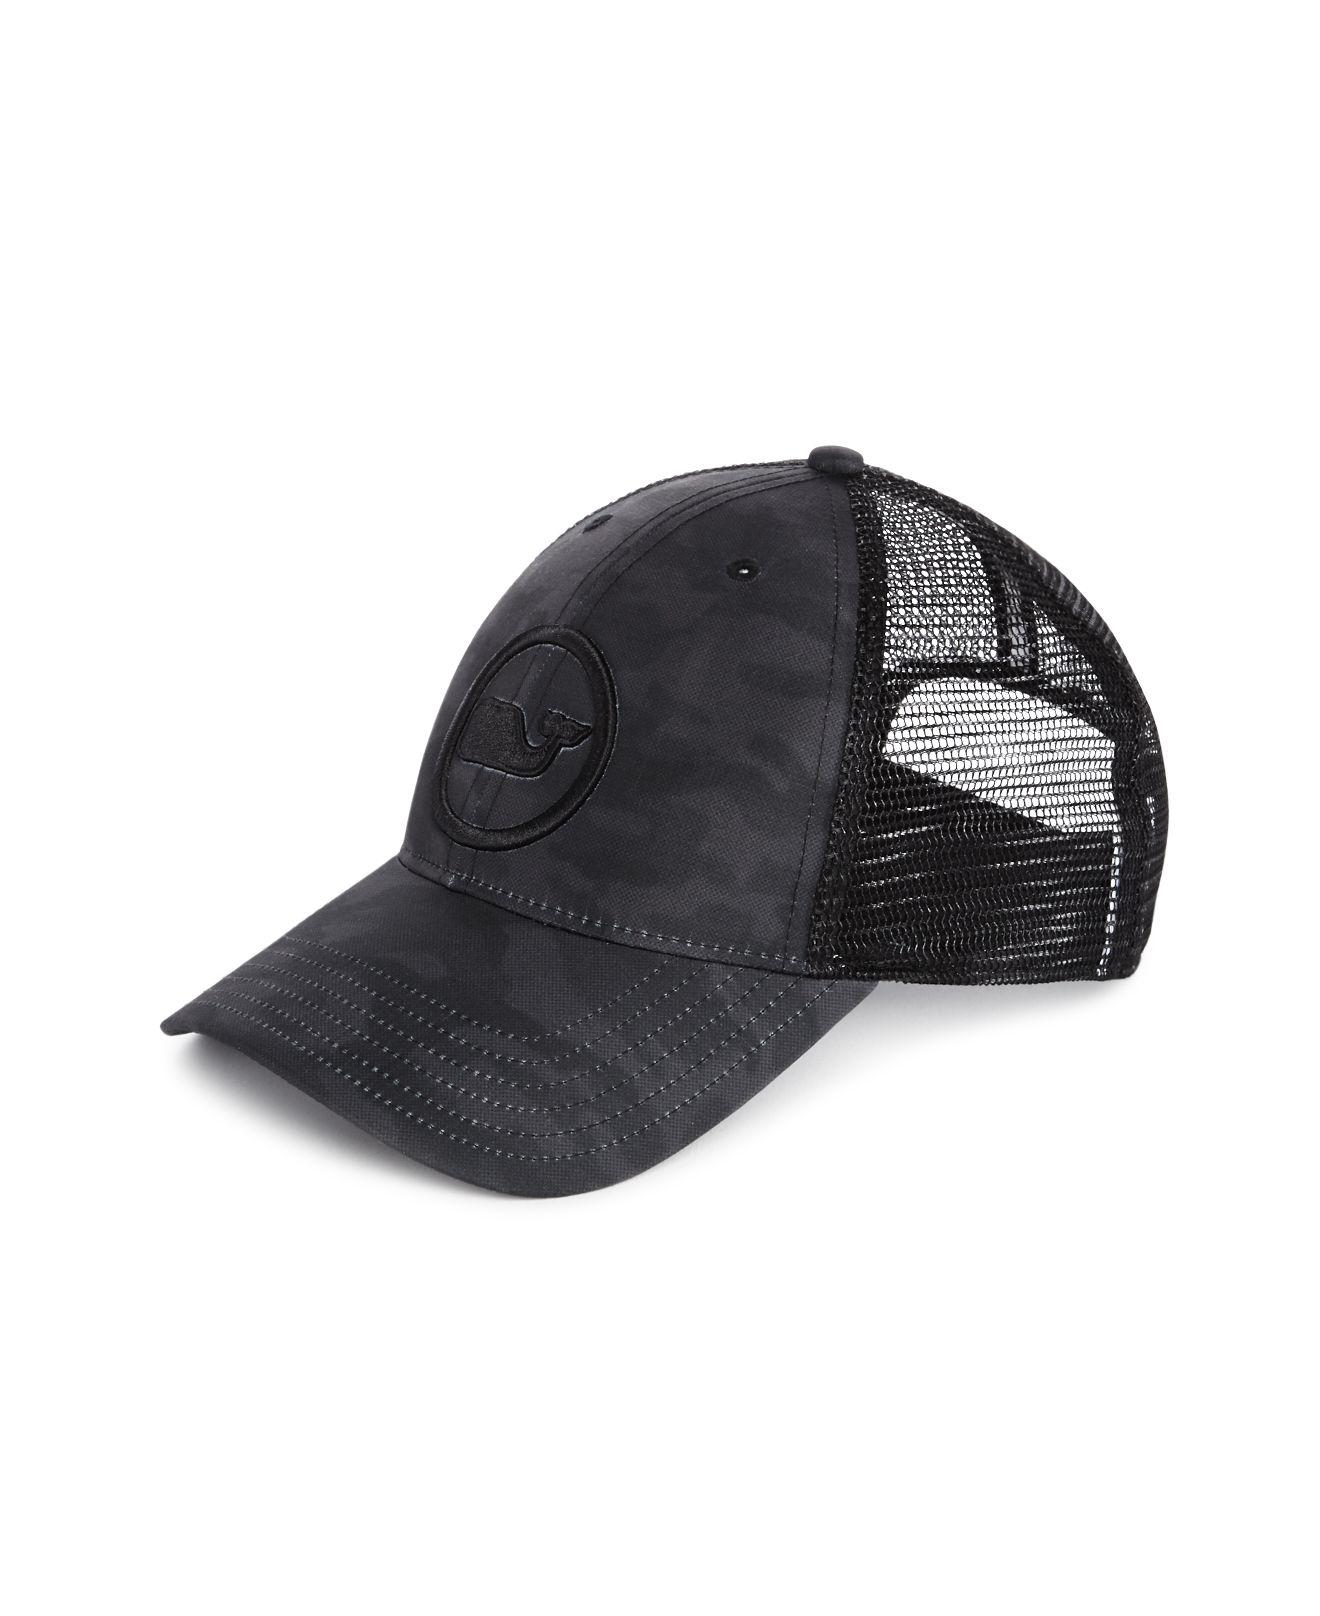 224579fe683da Vineyard Vines Camouflage Trucker Hat in Black for Men - Lyst